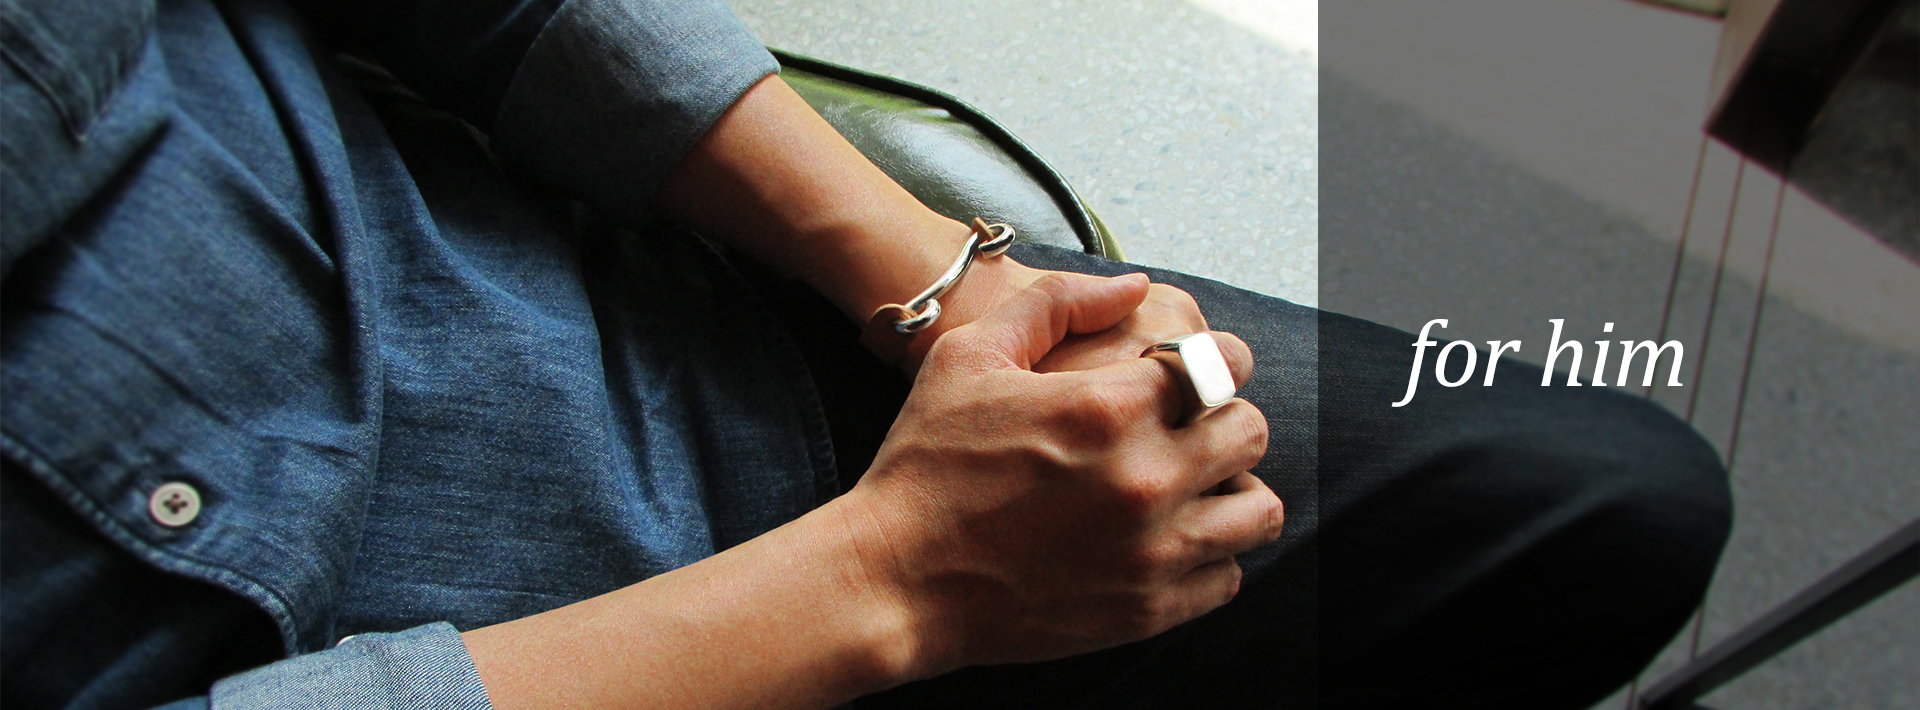 mittag jewelry男性商品